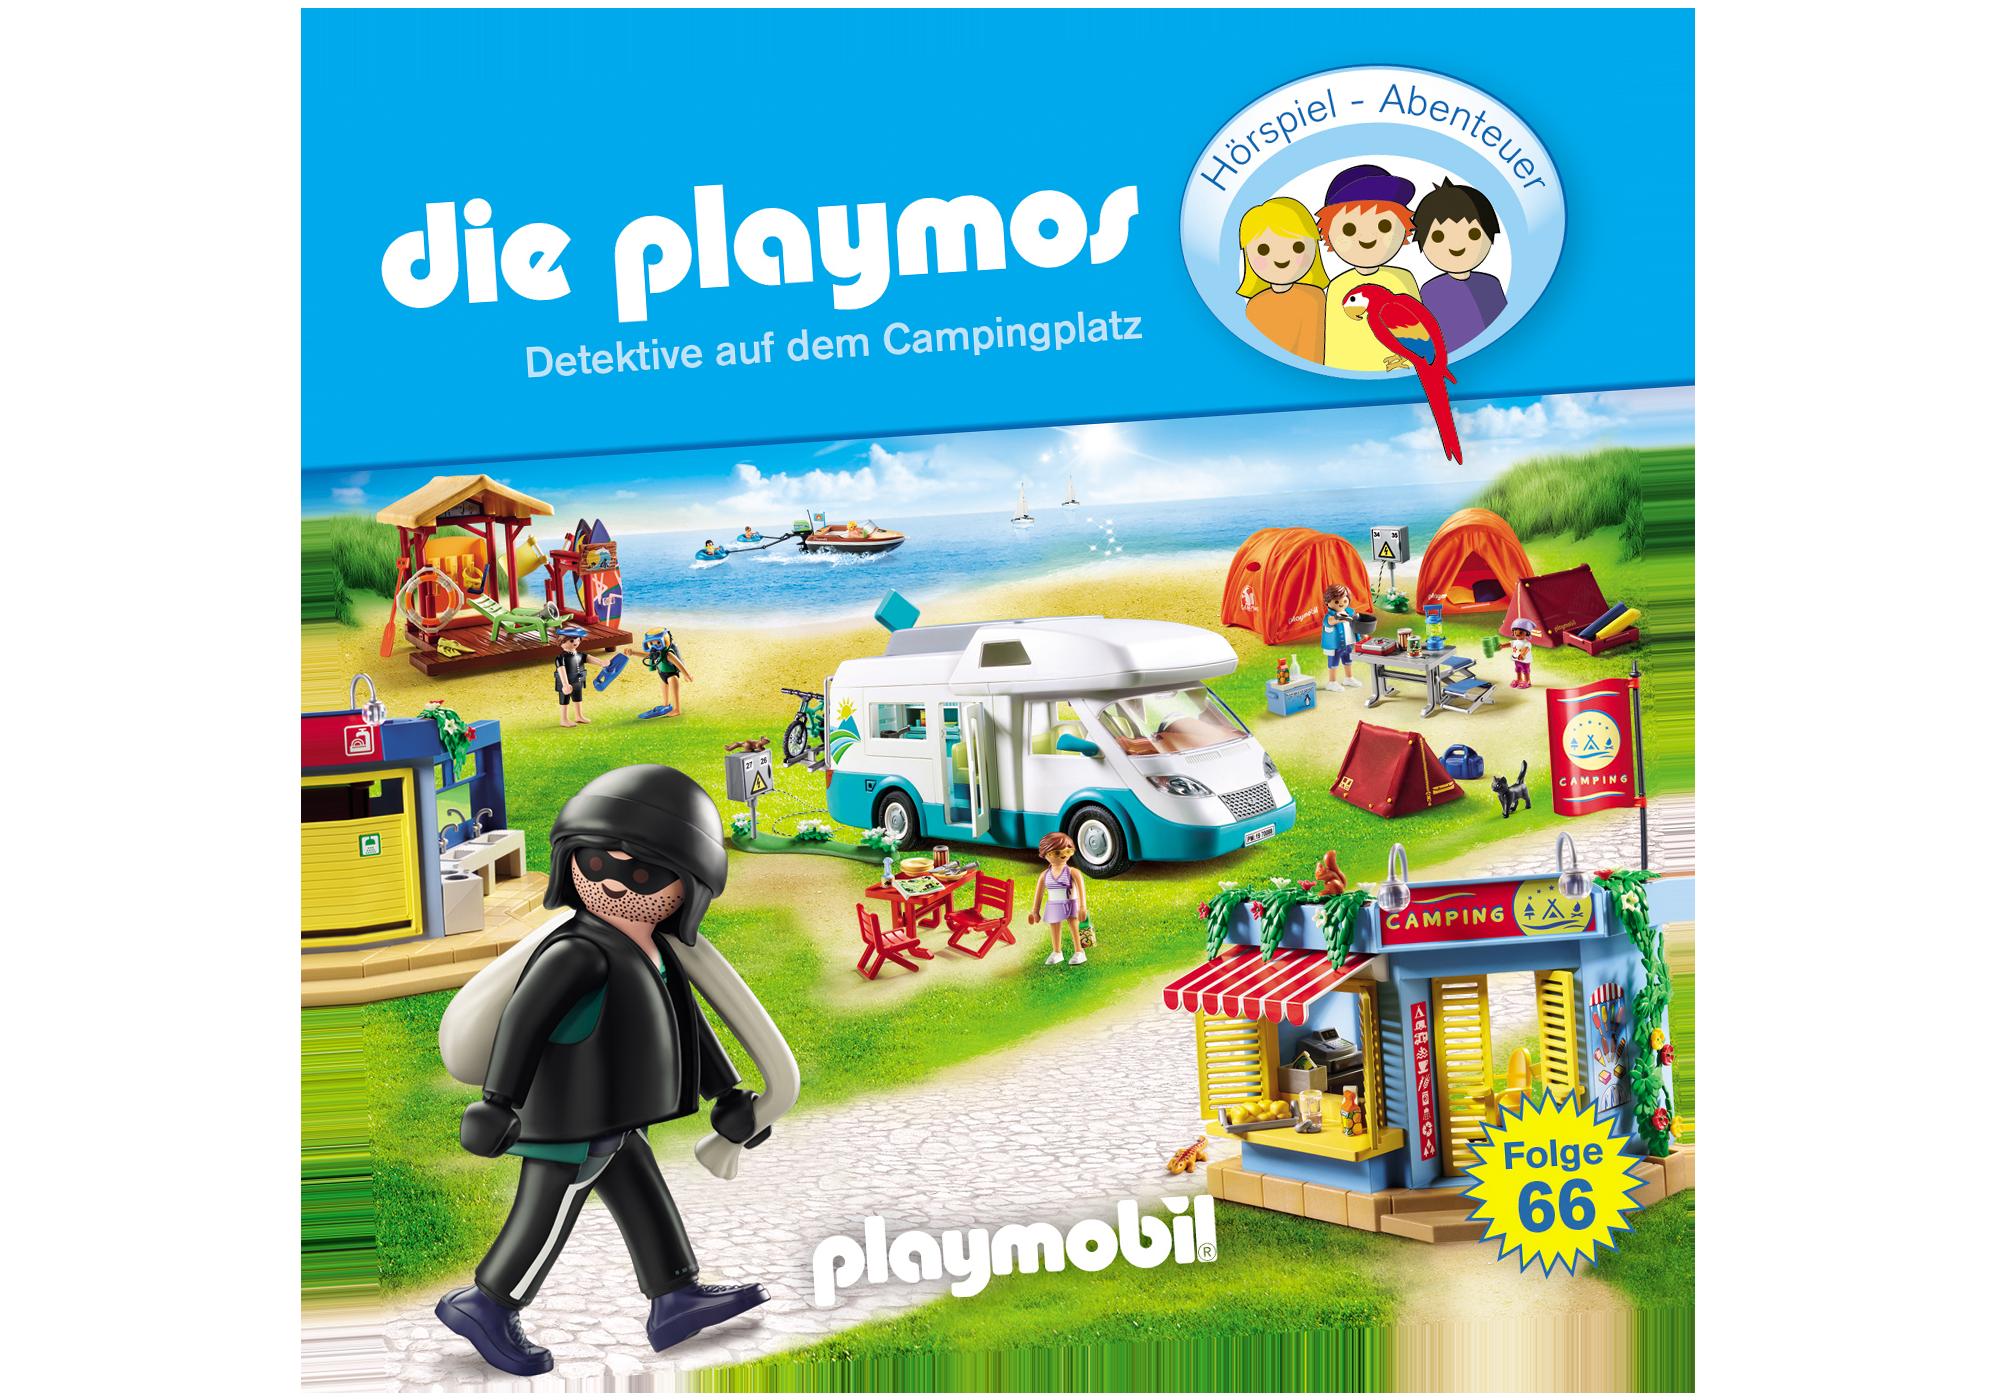 http://media.playmobil.com/i/playmobil/80136_product_detail/Detektive auf dem Campingplatz - Folge 66